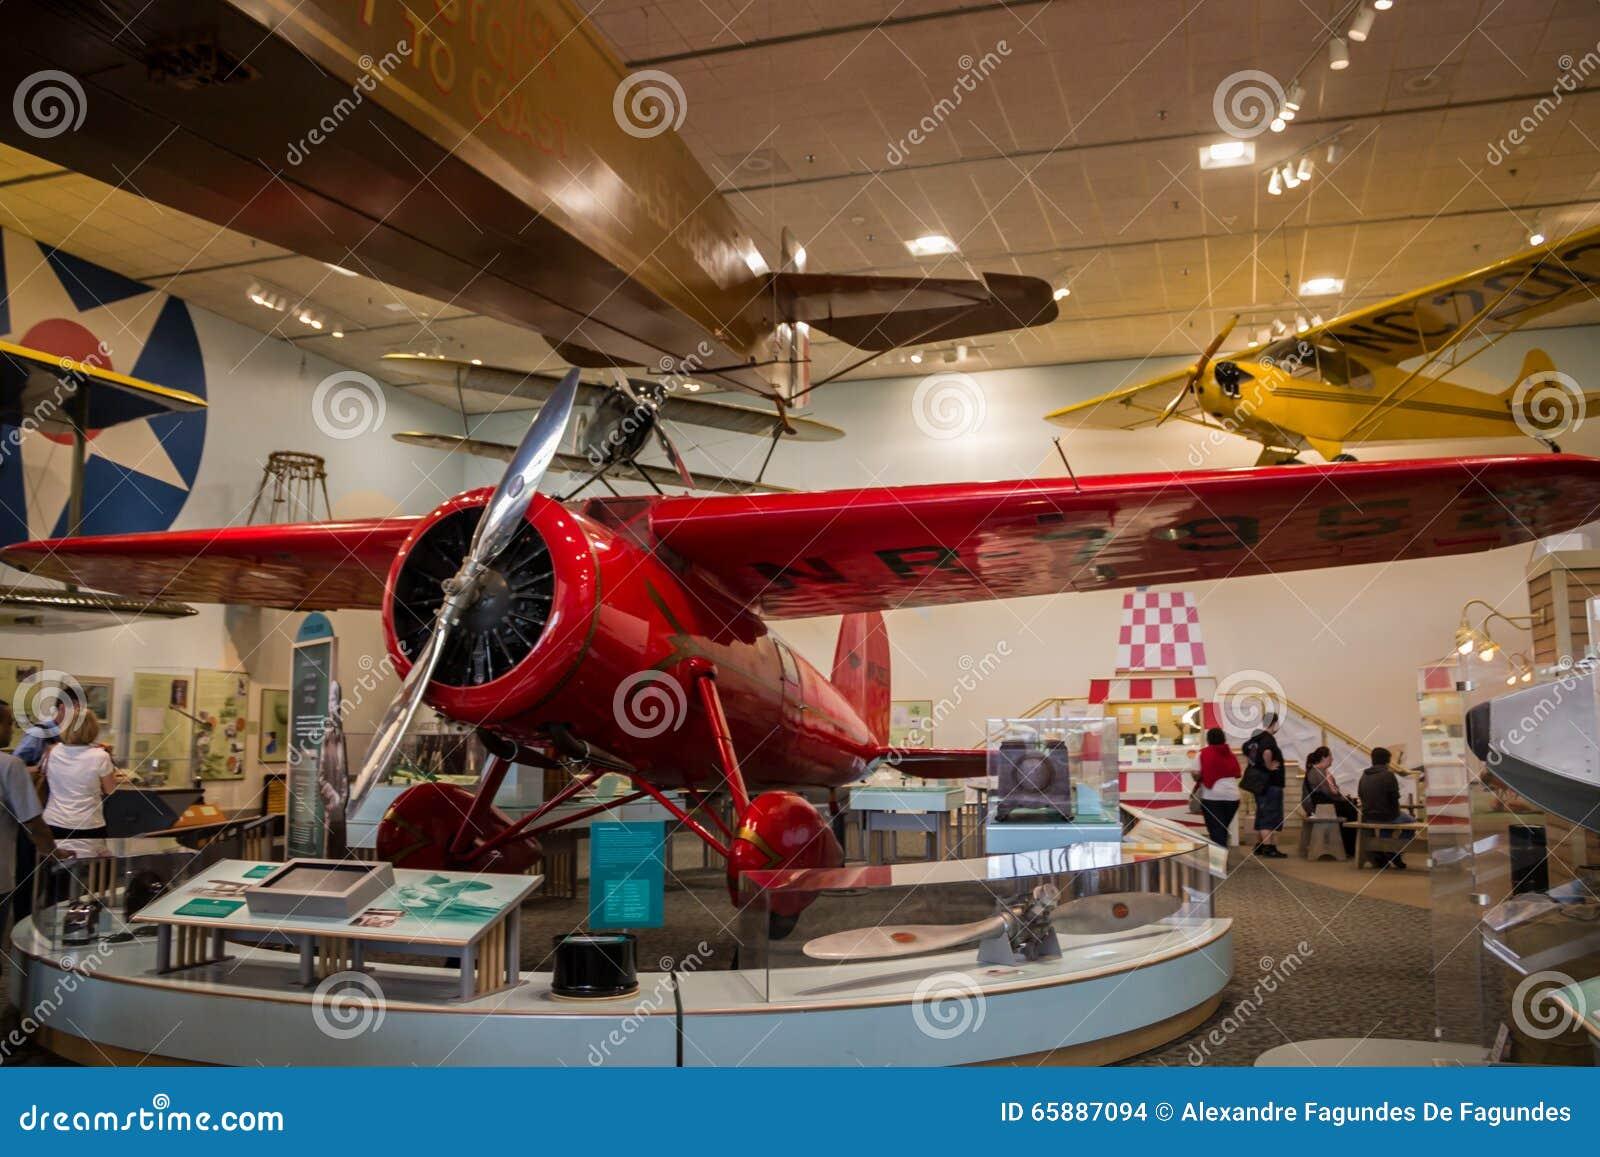 aviation museum business plan